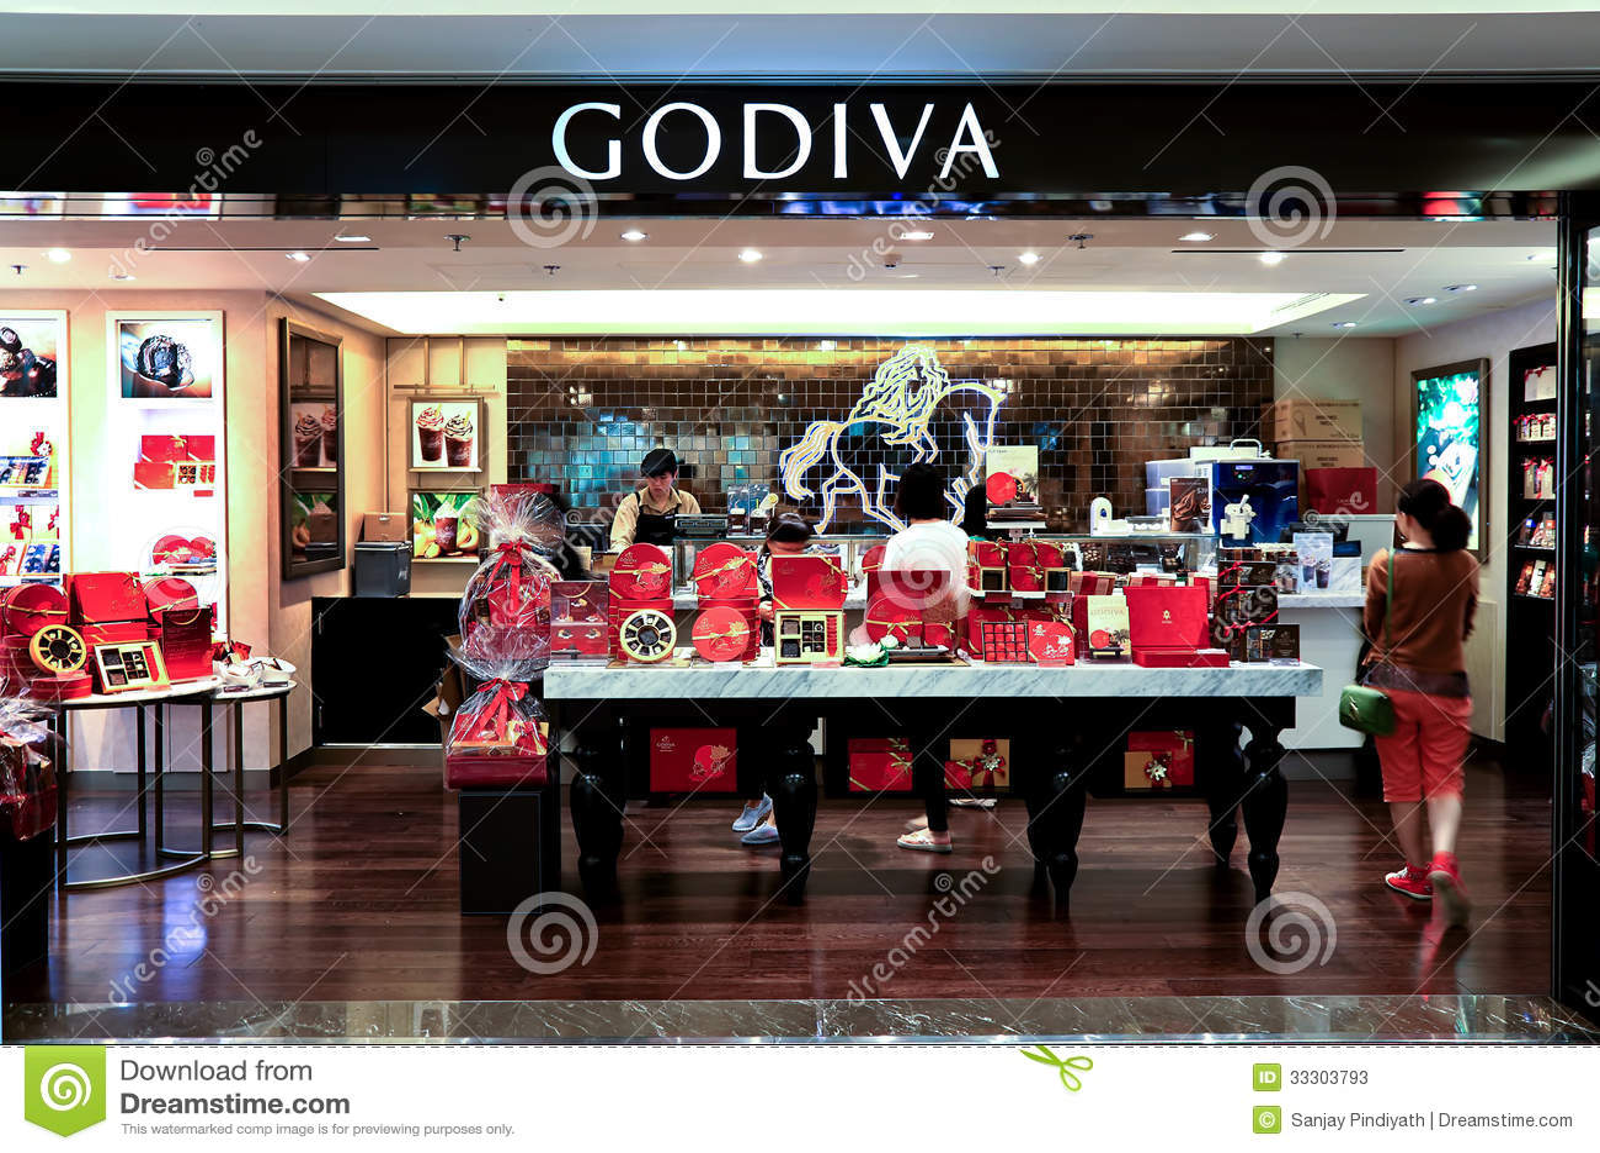 Godiva Chocolate Shop Editorial Stock Photo - Image: 33303793